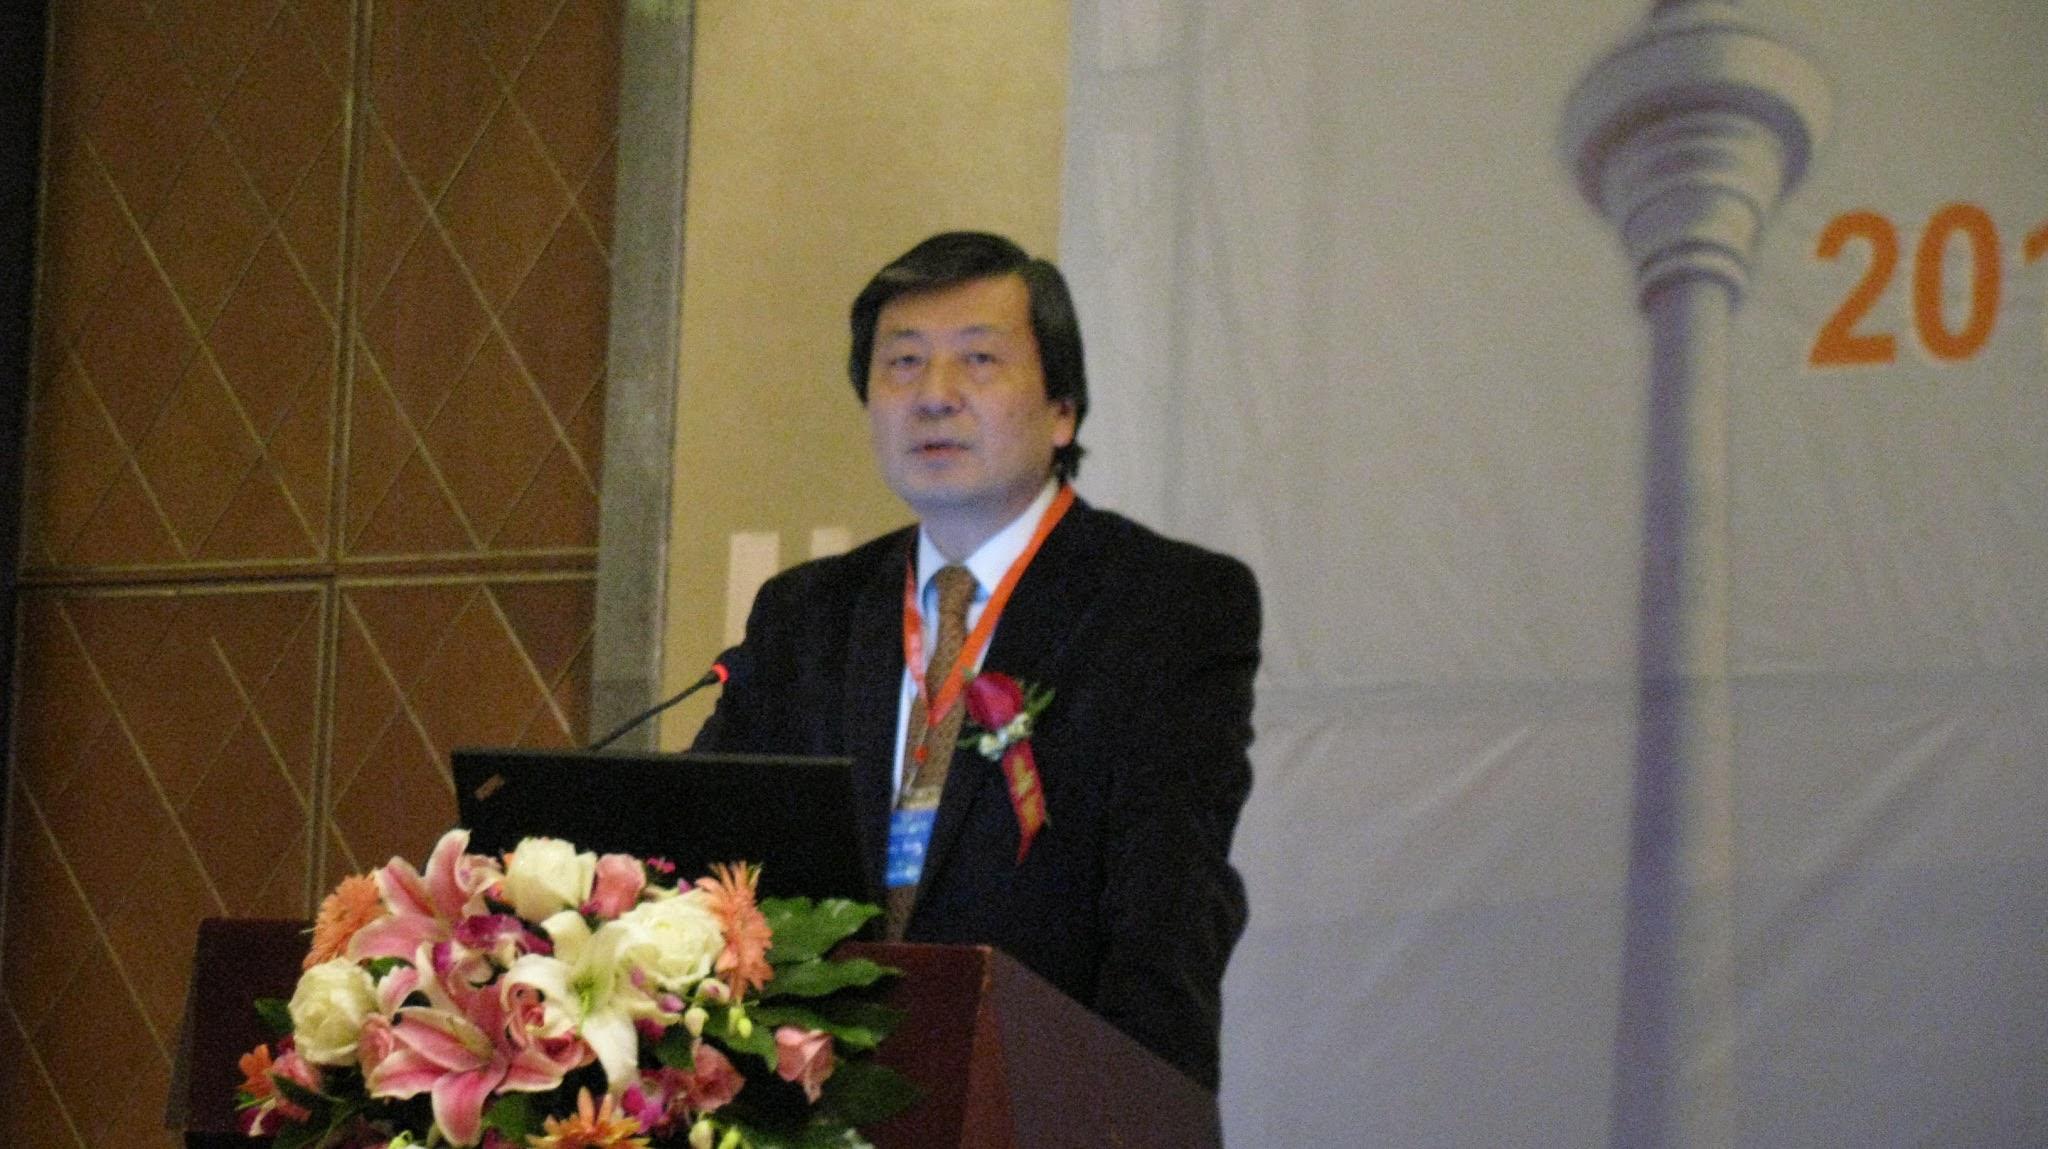 Photo: plenary talk by Professor Asada (Dec. 15, Wed.)